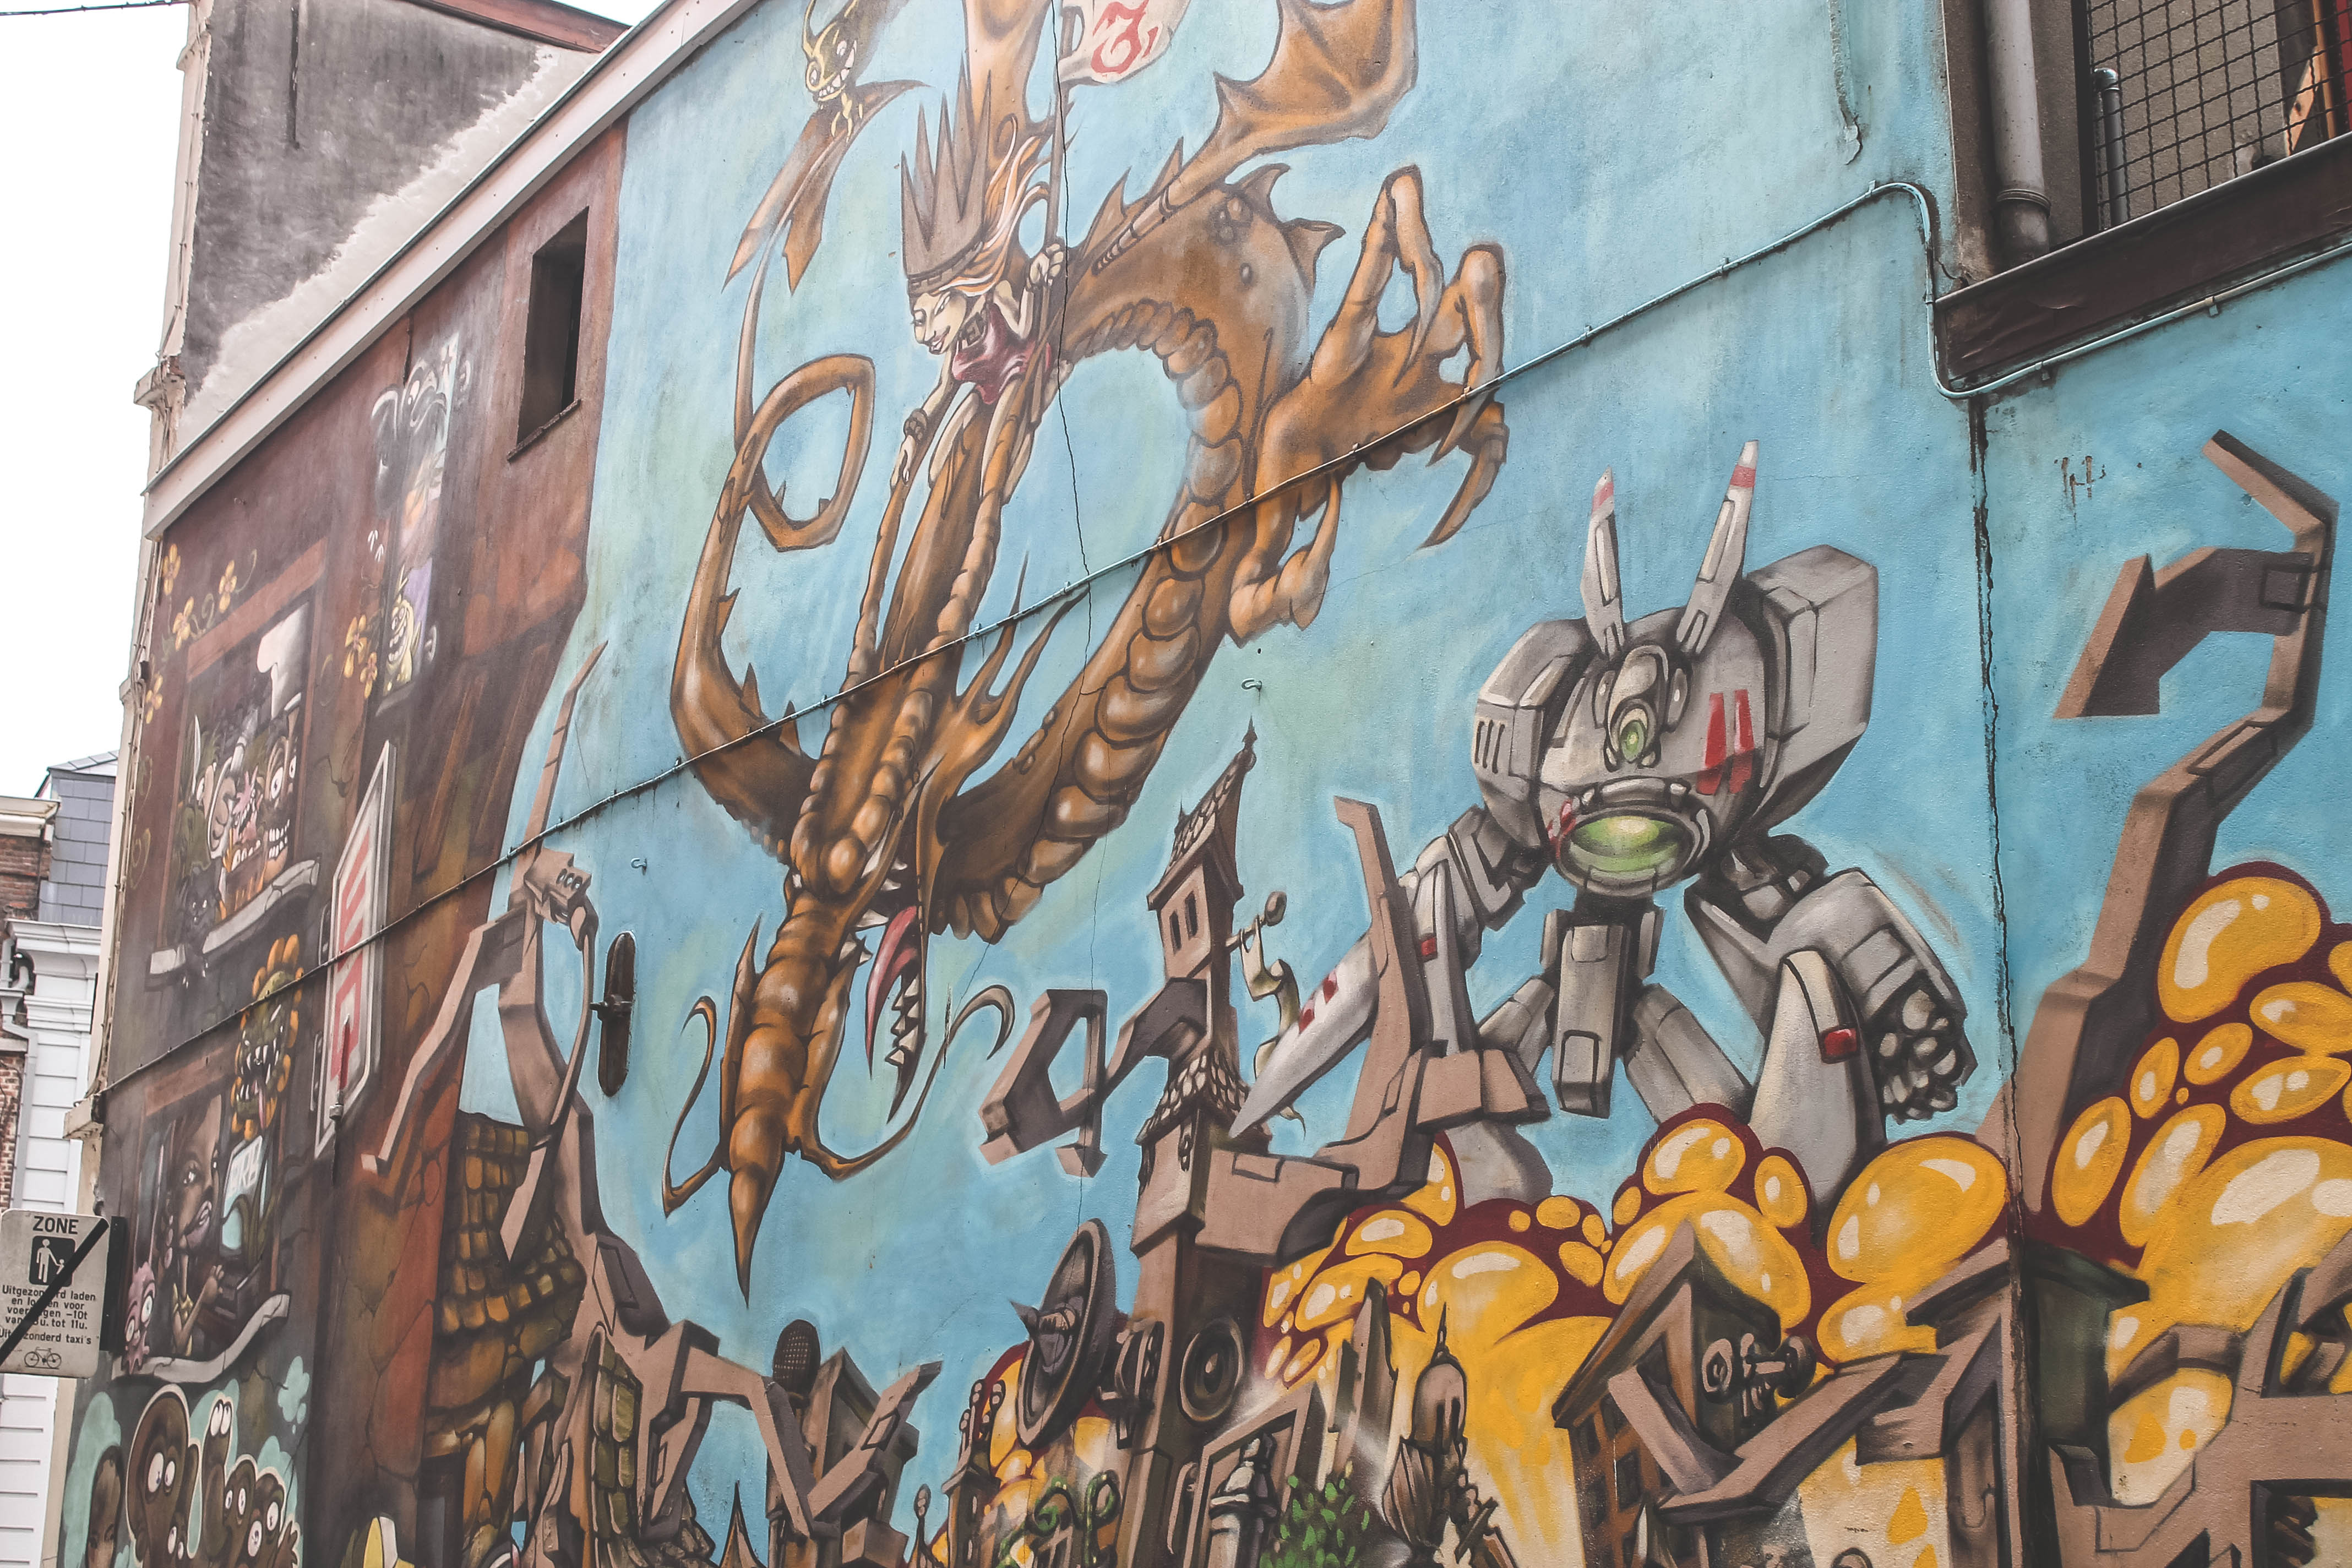 Weekendje Gent - Graffiti & street-art in gent